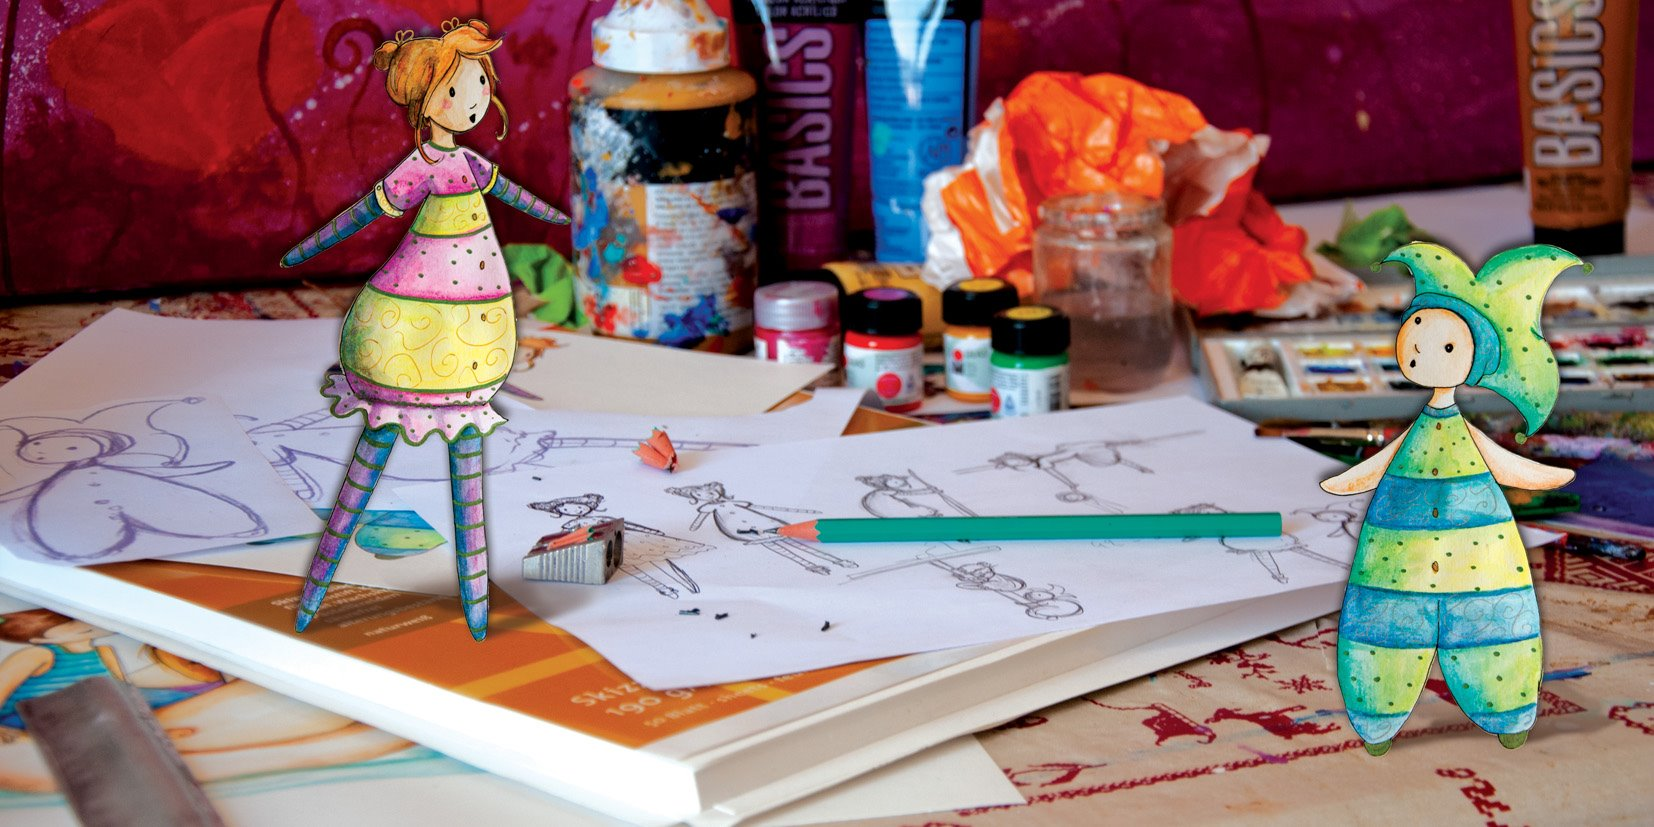 lutine et lutin en illustration jeunesse